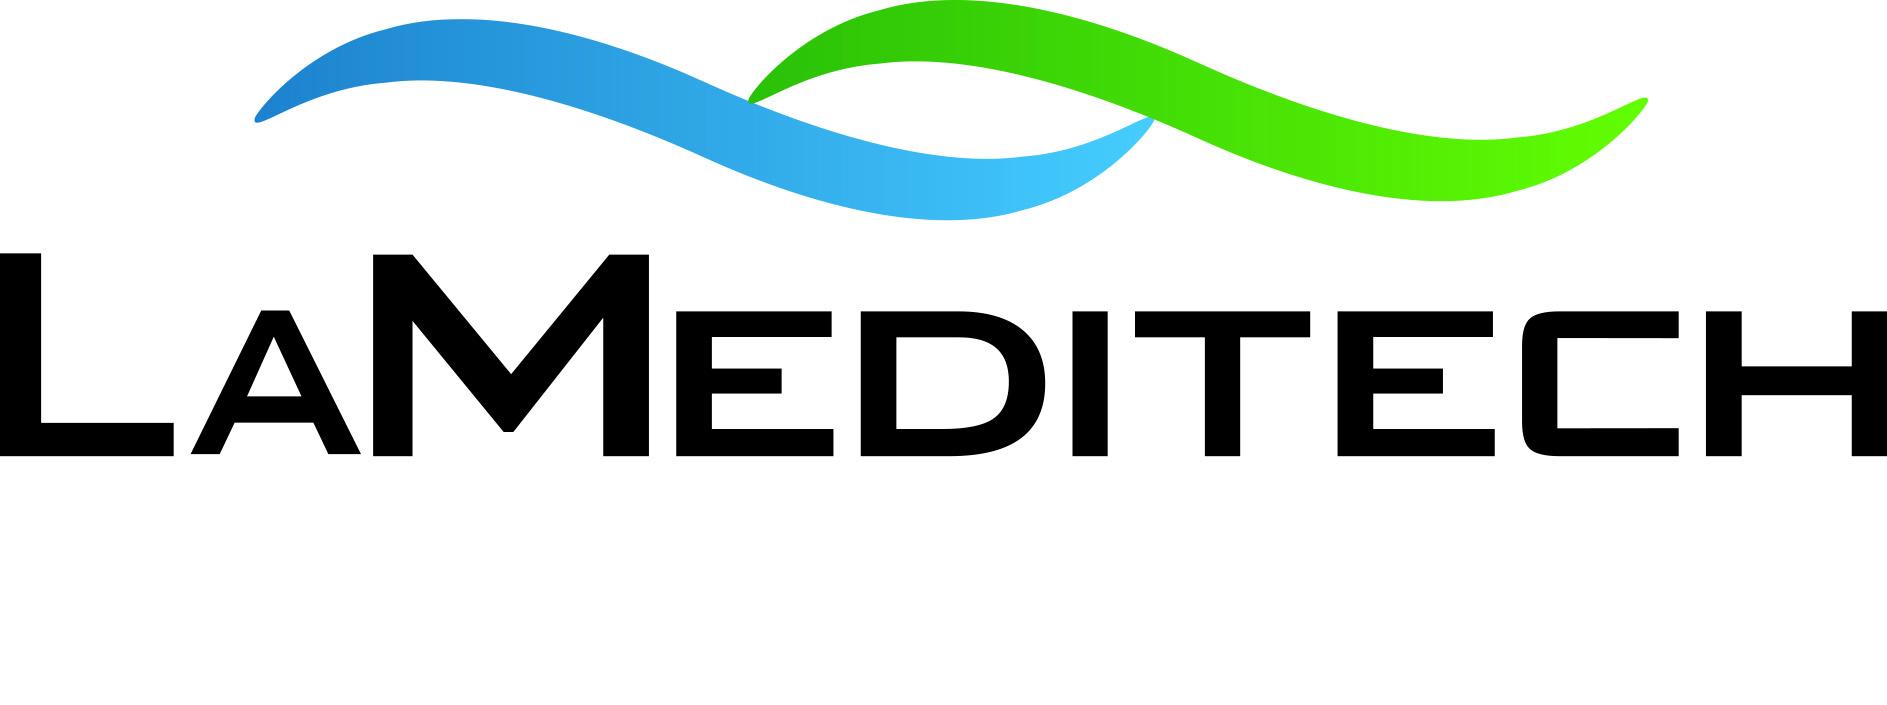 LaMeditech Co., LTD.